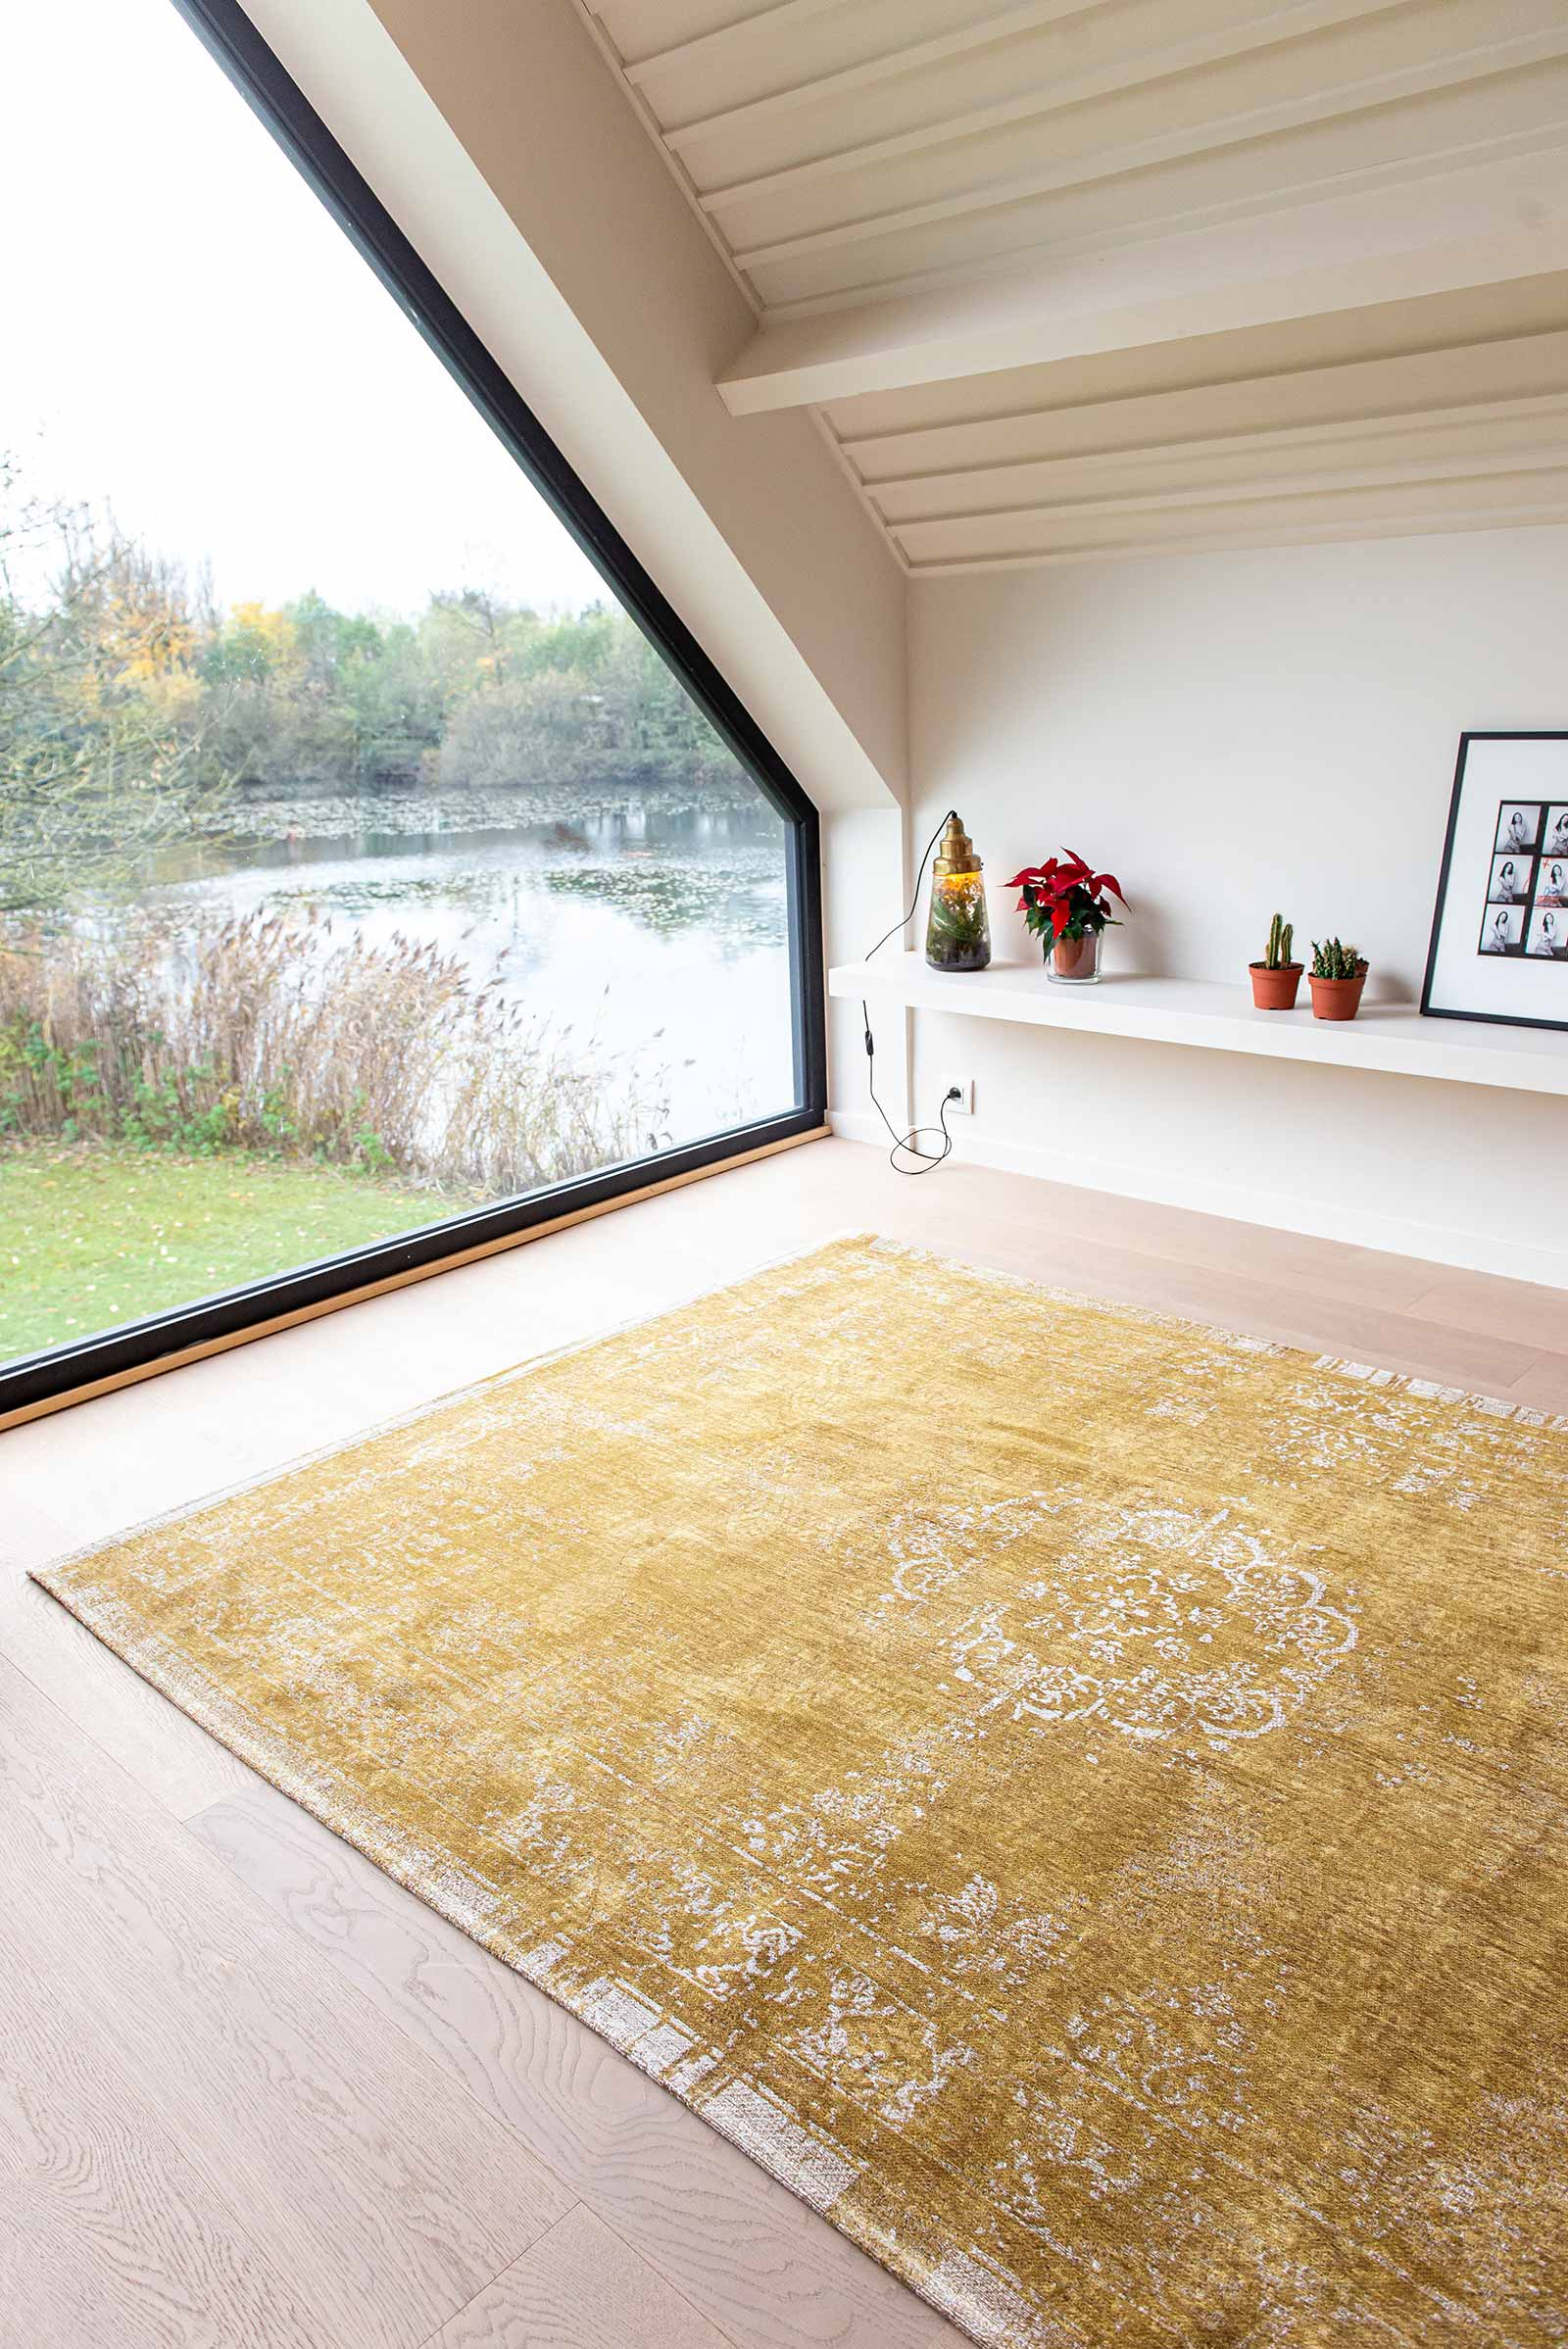 Louis De Poortere alfombra LX 9145 Fading World Spring Moss interior 10